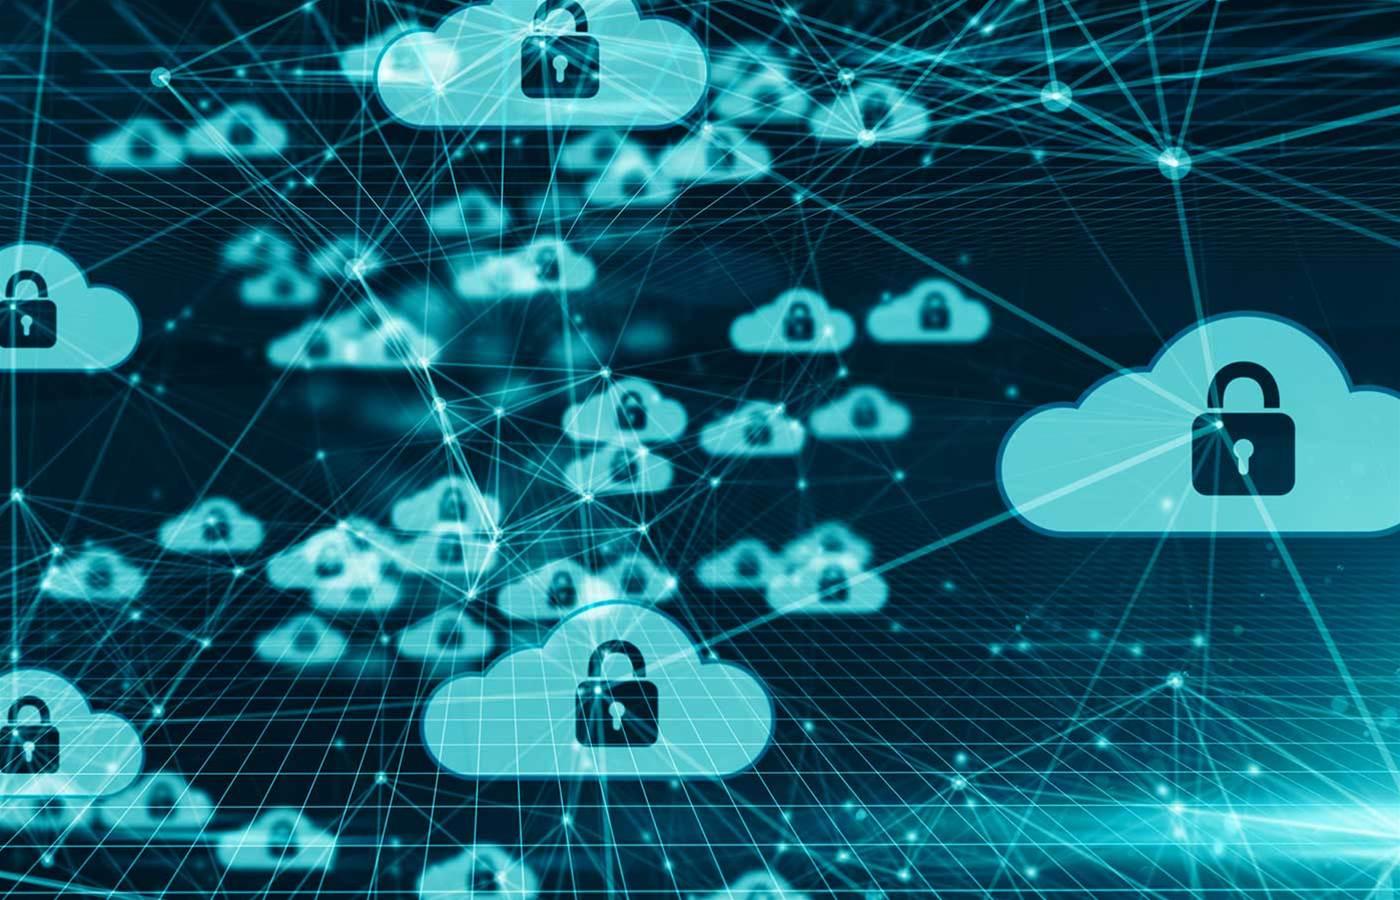 Virtustream upgrades itself to offer multi-cloud management